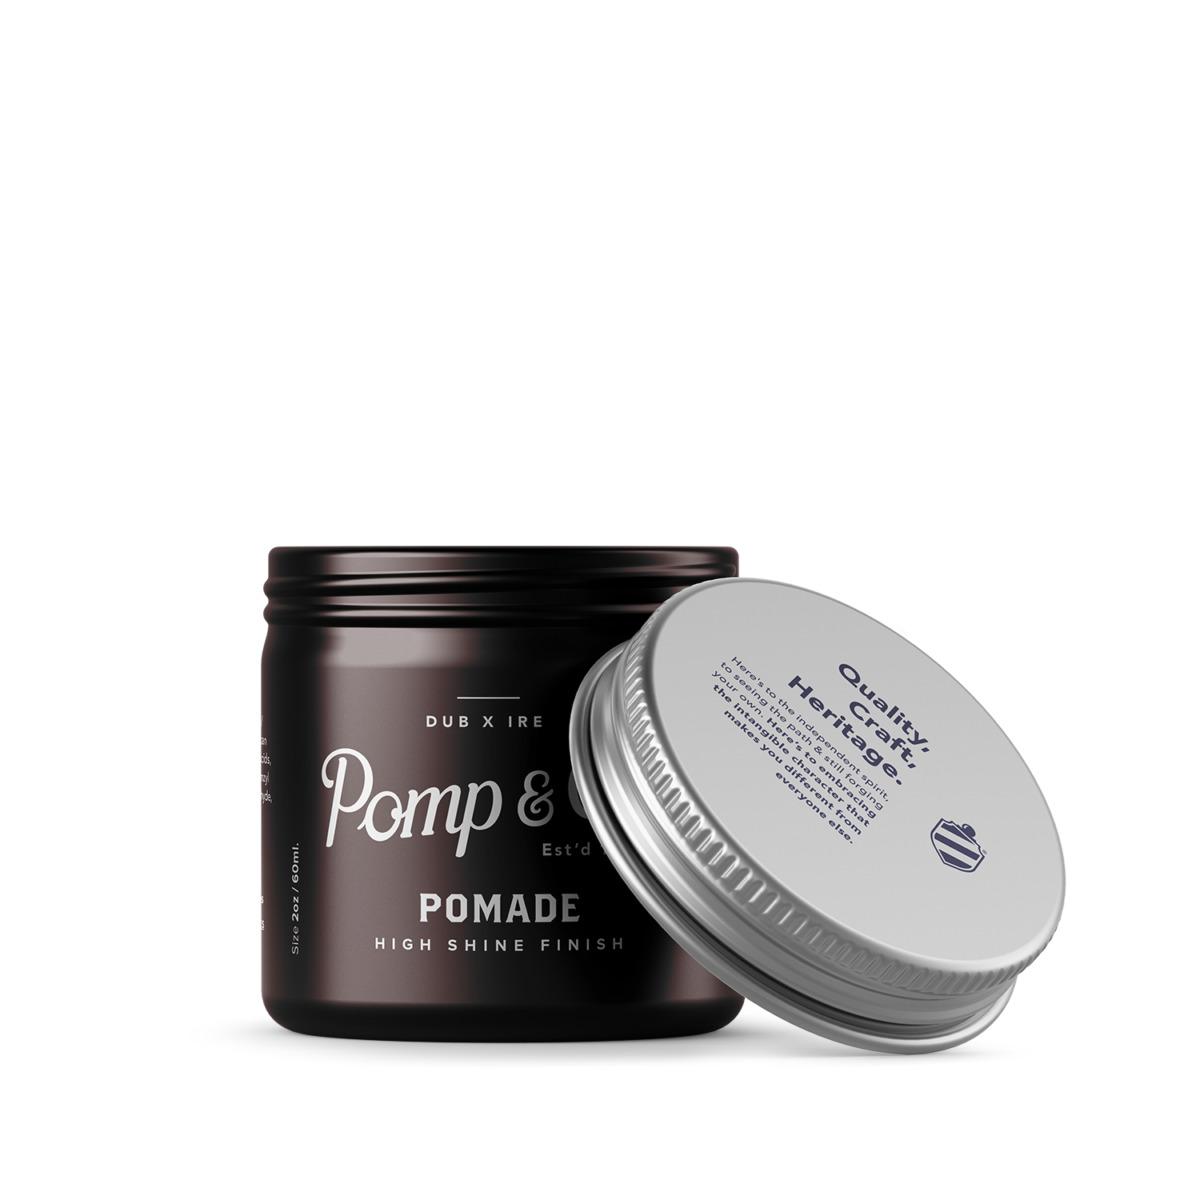 Tuotekuva: Pomp&Co. Pomade (60ml)